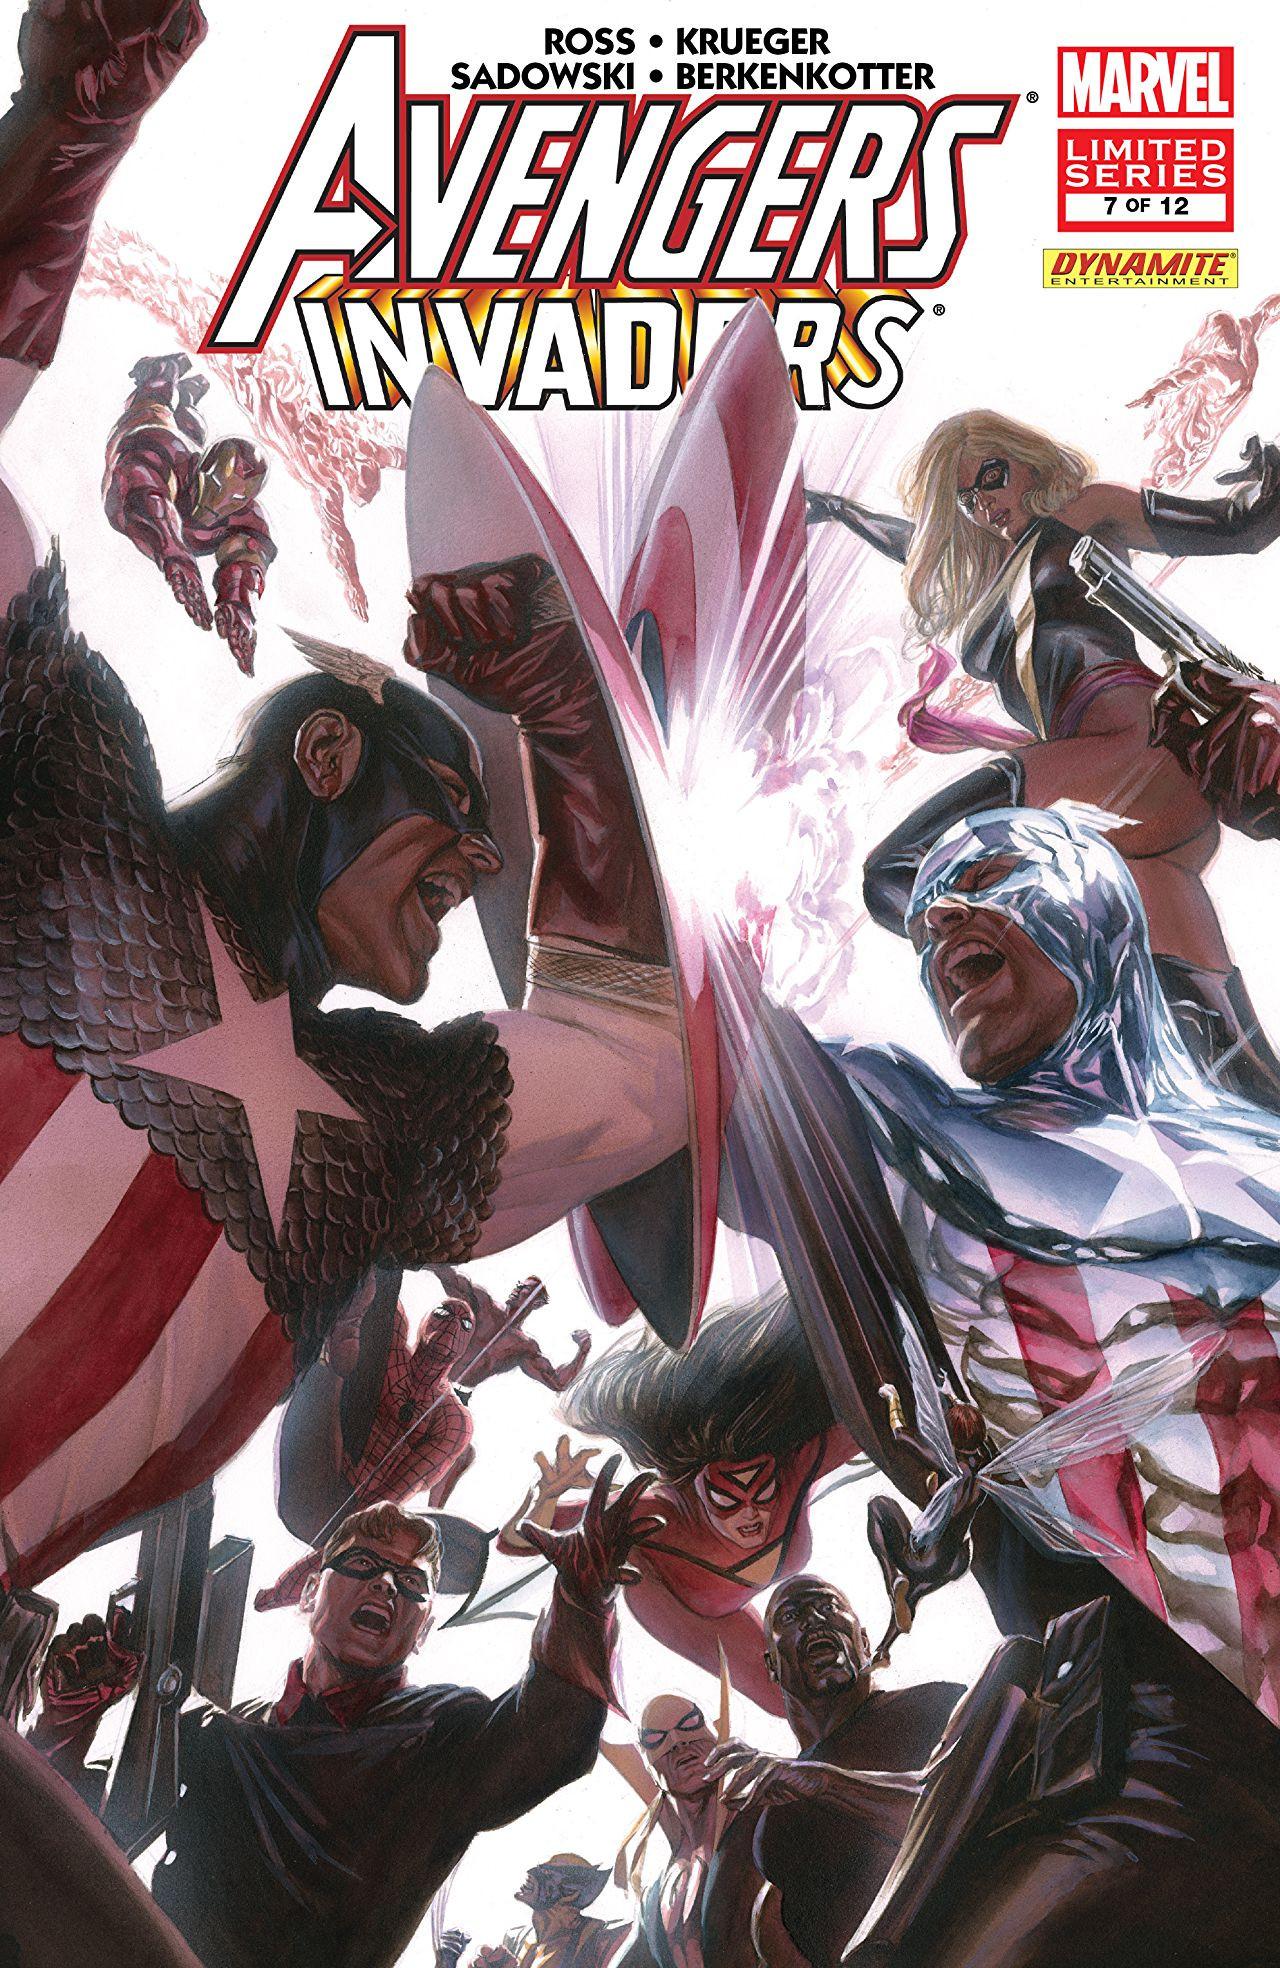 Avengers Invaders Vol 1 7